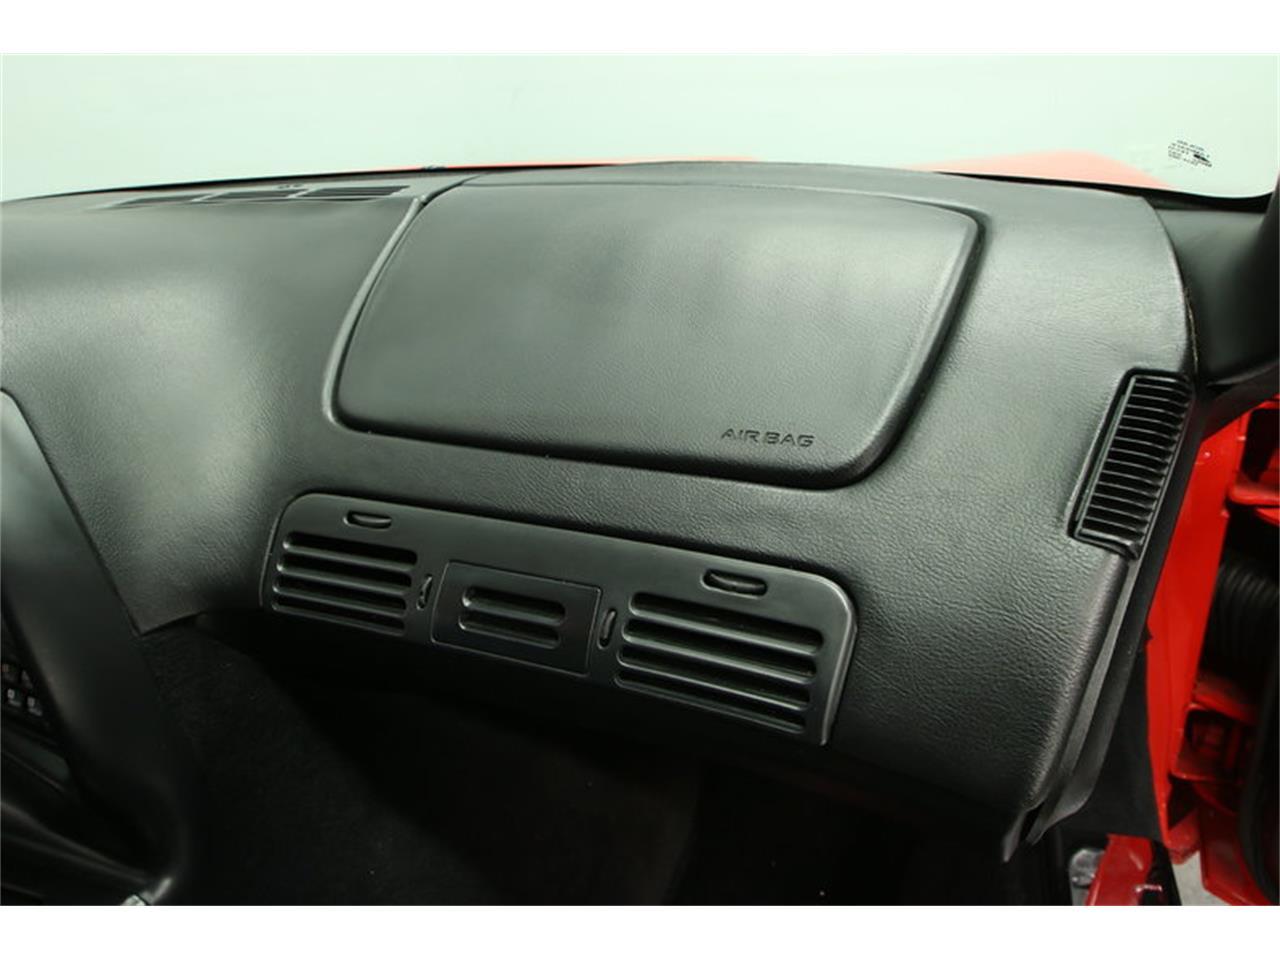 Large Picture of 1995 Chevrolet Corvette located in Florida - $15,995.00 - IURO